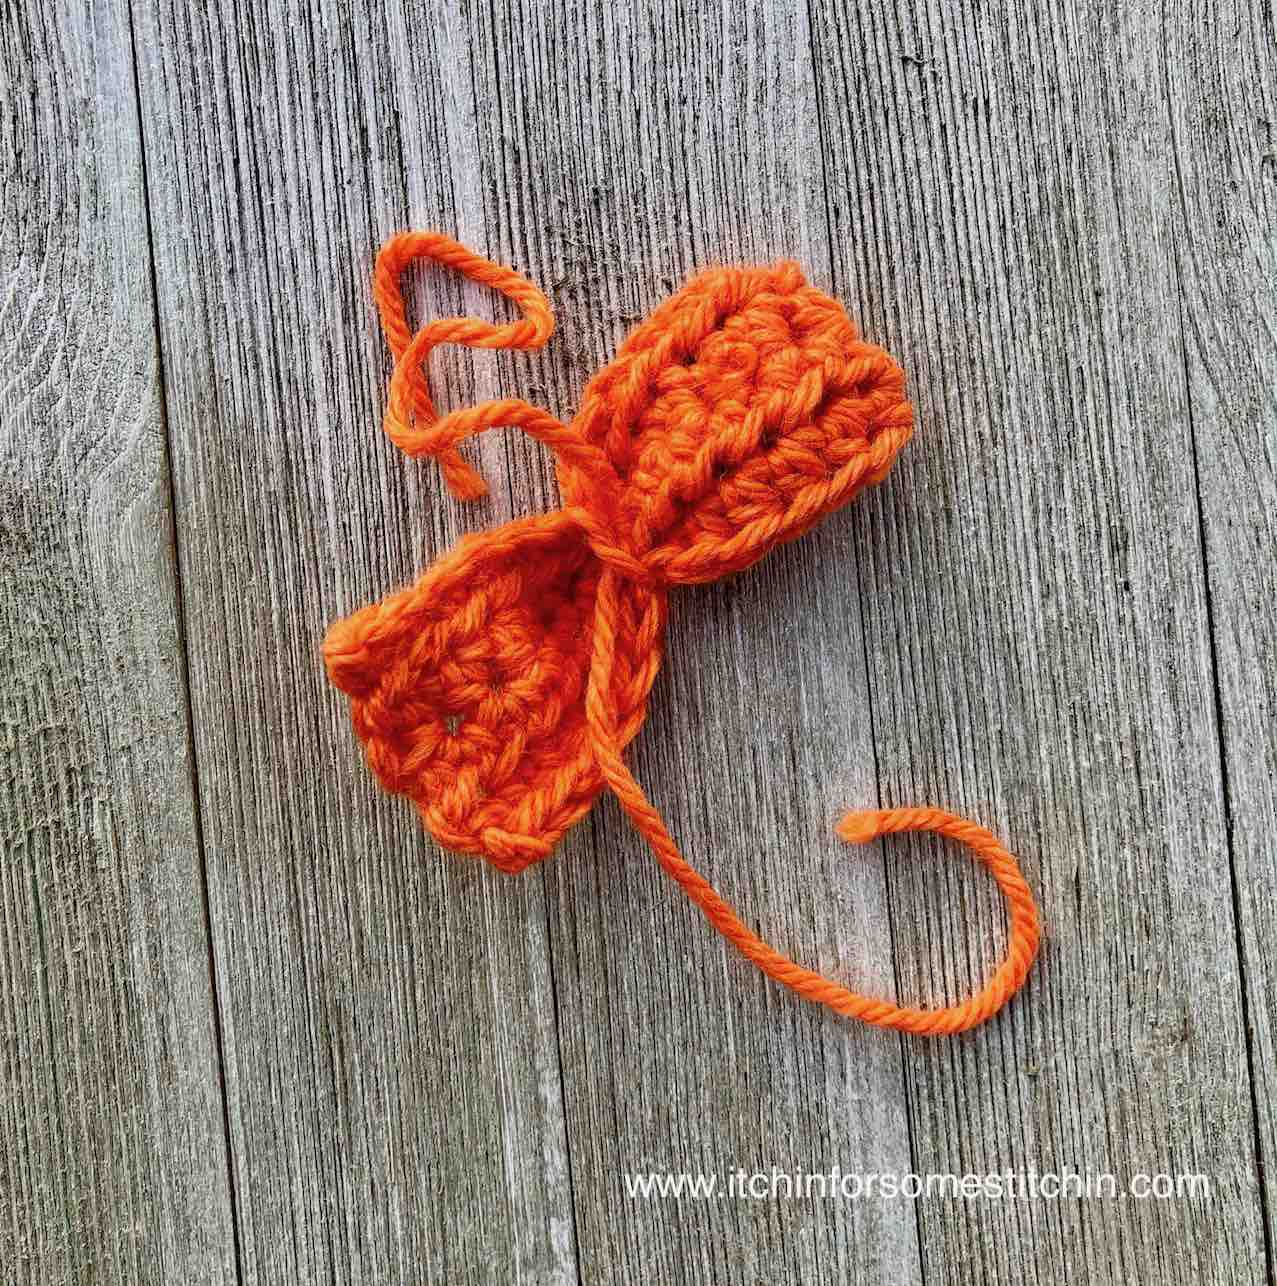 How to Crochet a Bowtie by www.itchinforsomestitchin.com